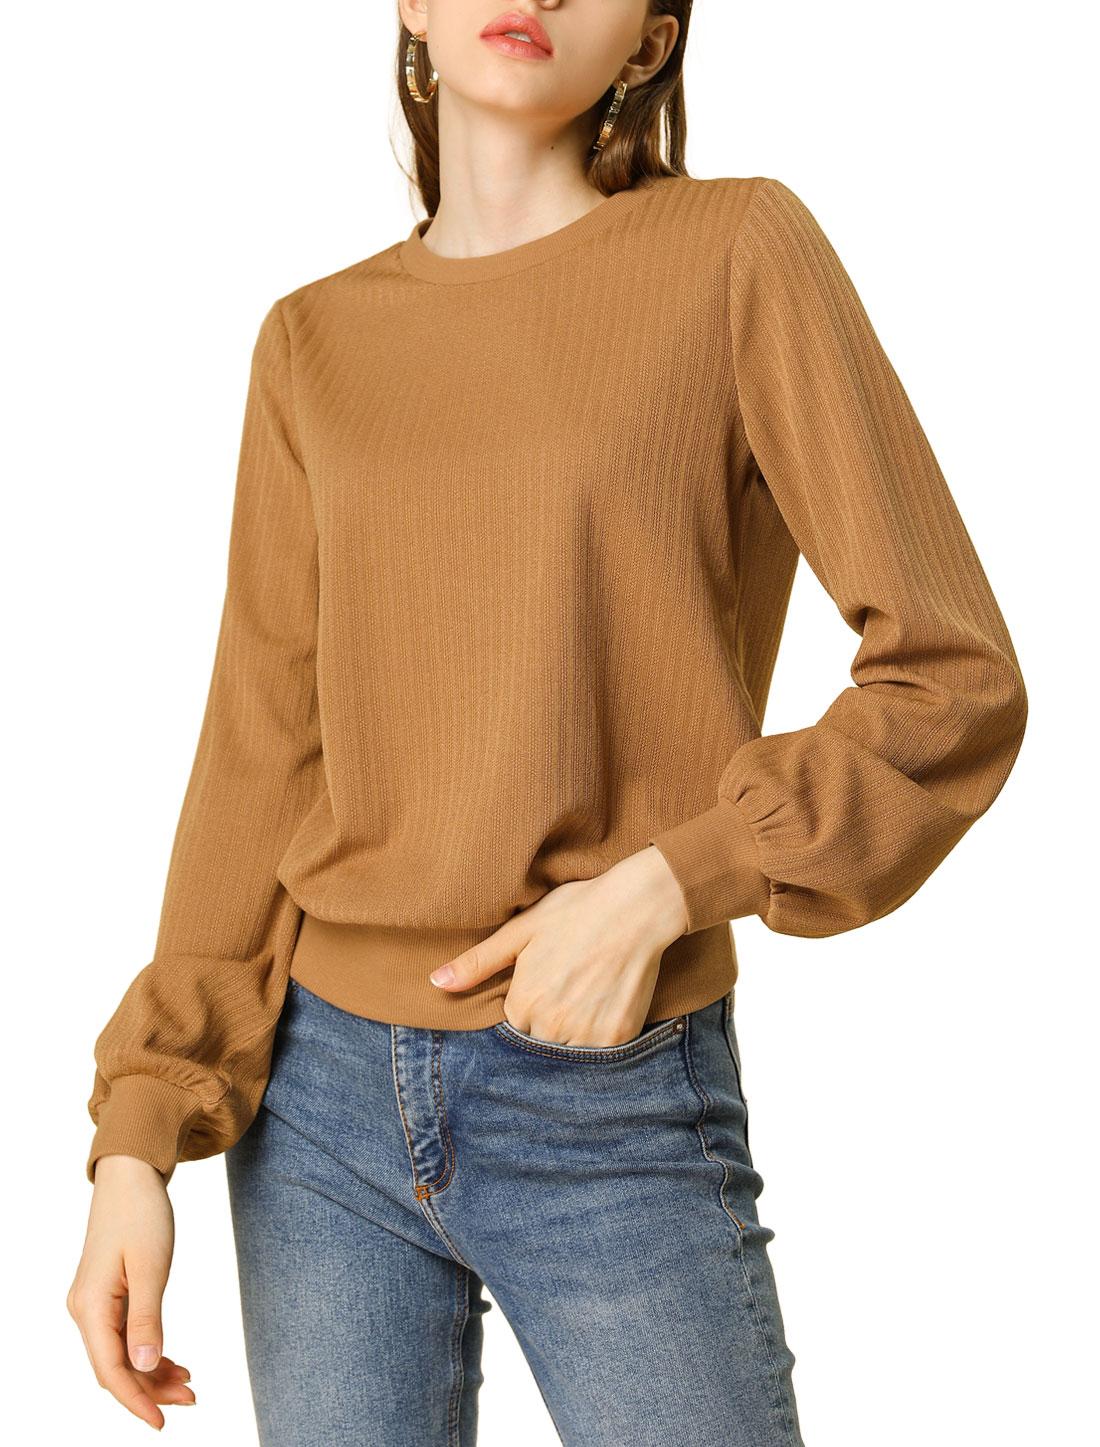 Allegra K Women's Classic Lantern Sleeves Blouson Ribbed Top Sweater Brown XS